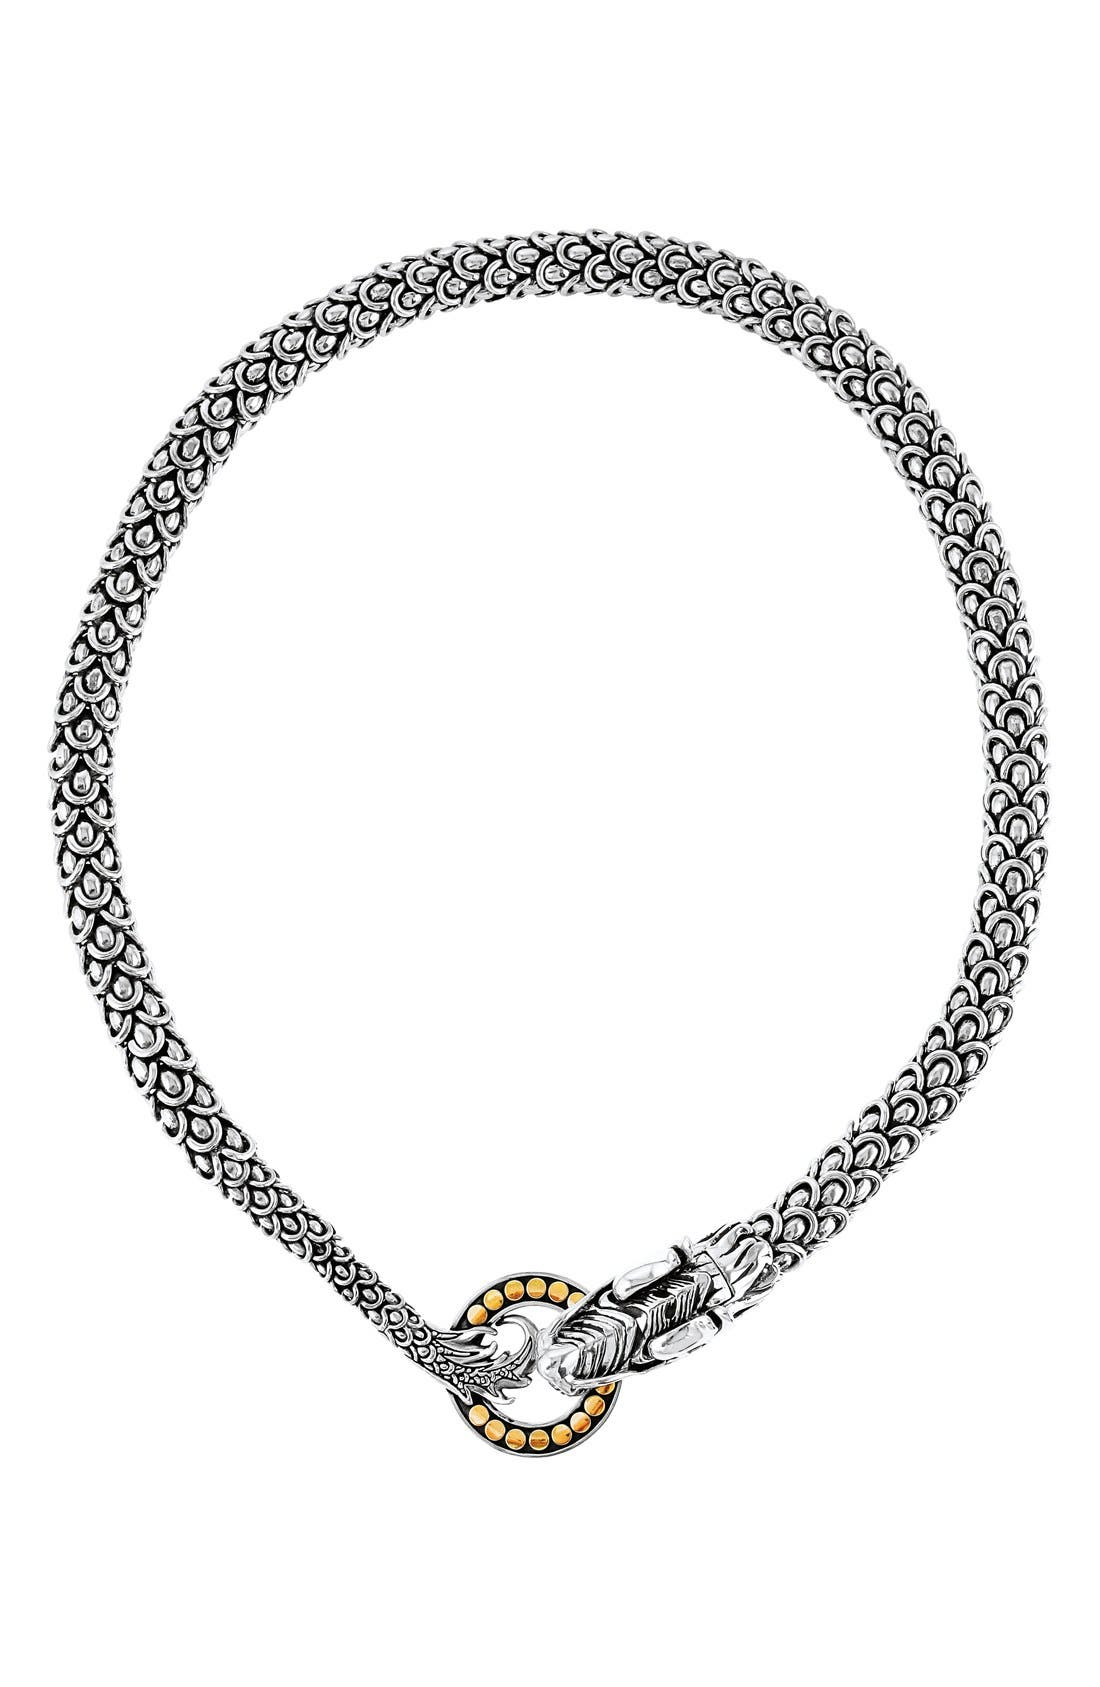 'Naga' Dragon Necklace,                             Main thumbnail 1, color,                             NO COLOR